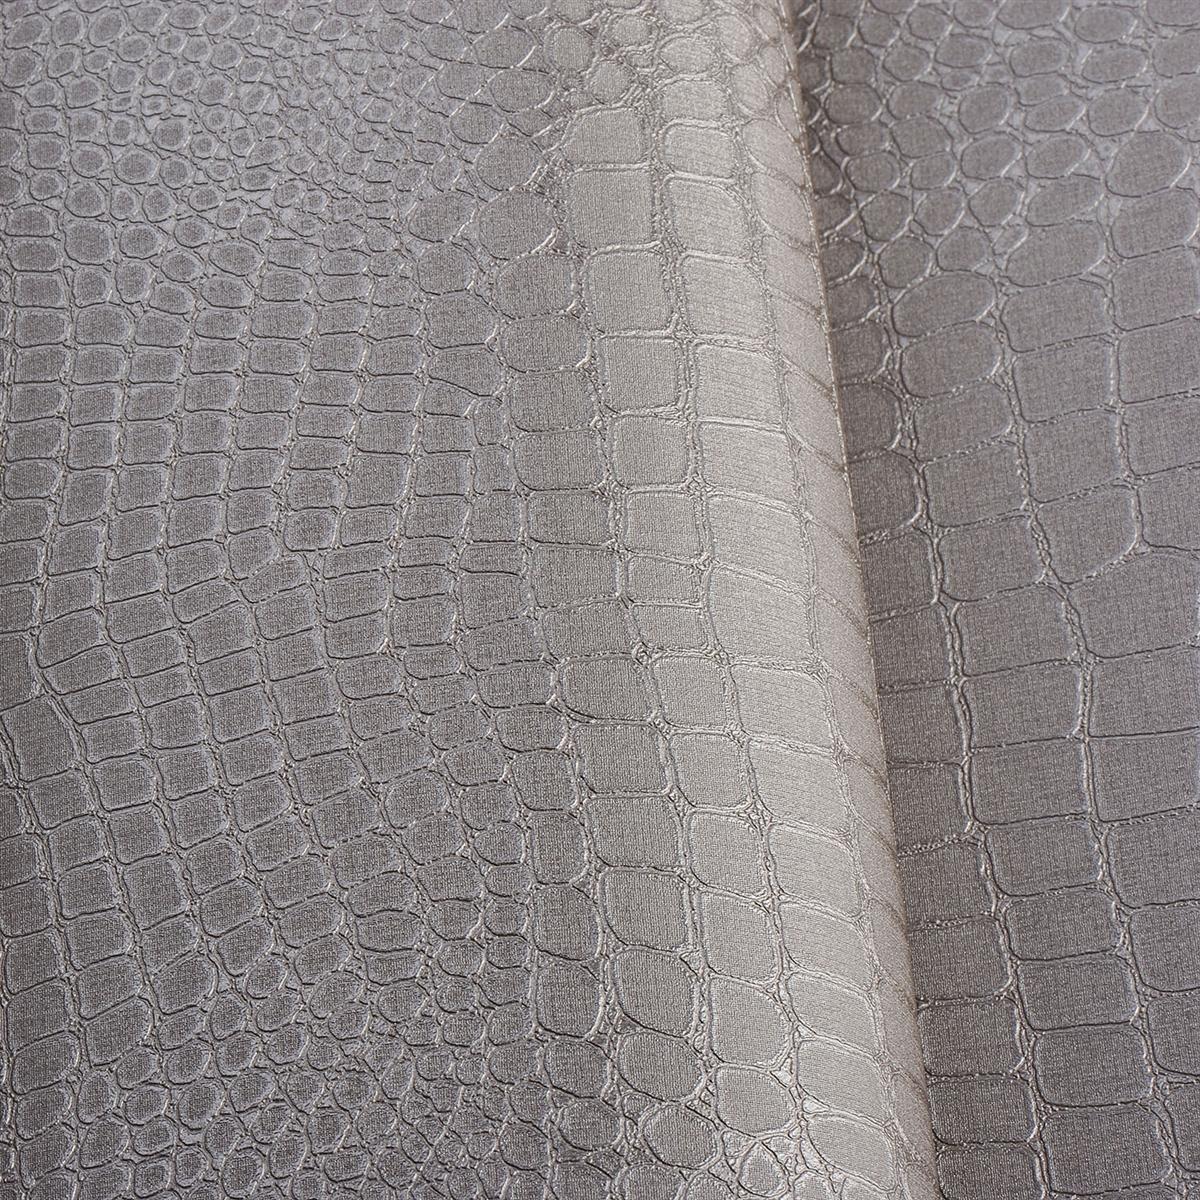 MODERN WALLPAPER ROLLS 10M DAMASK CROCODILE TEXTURED ANIMAL PRINT 1200x1200